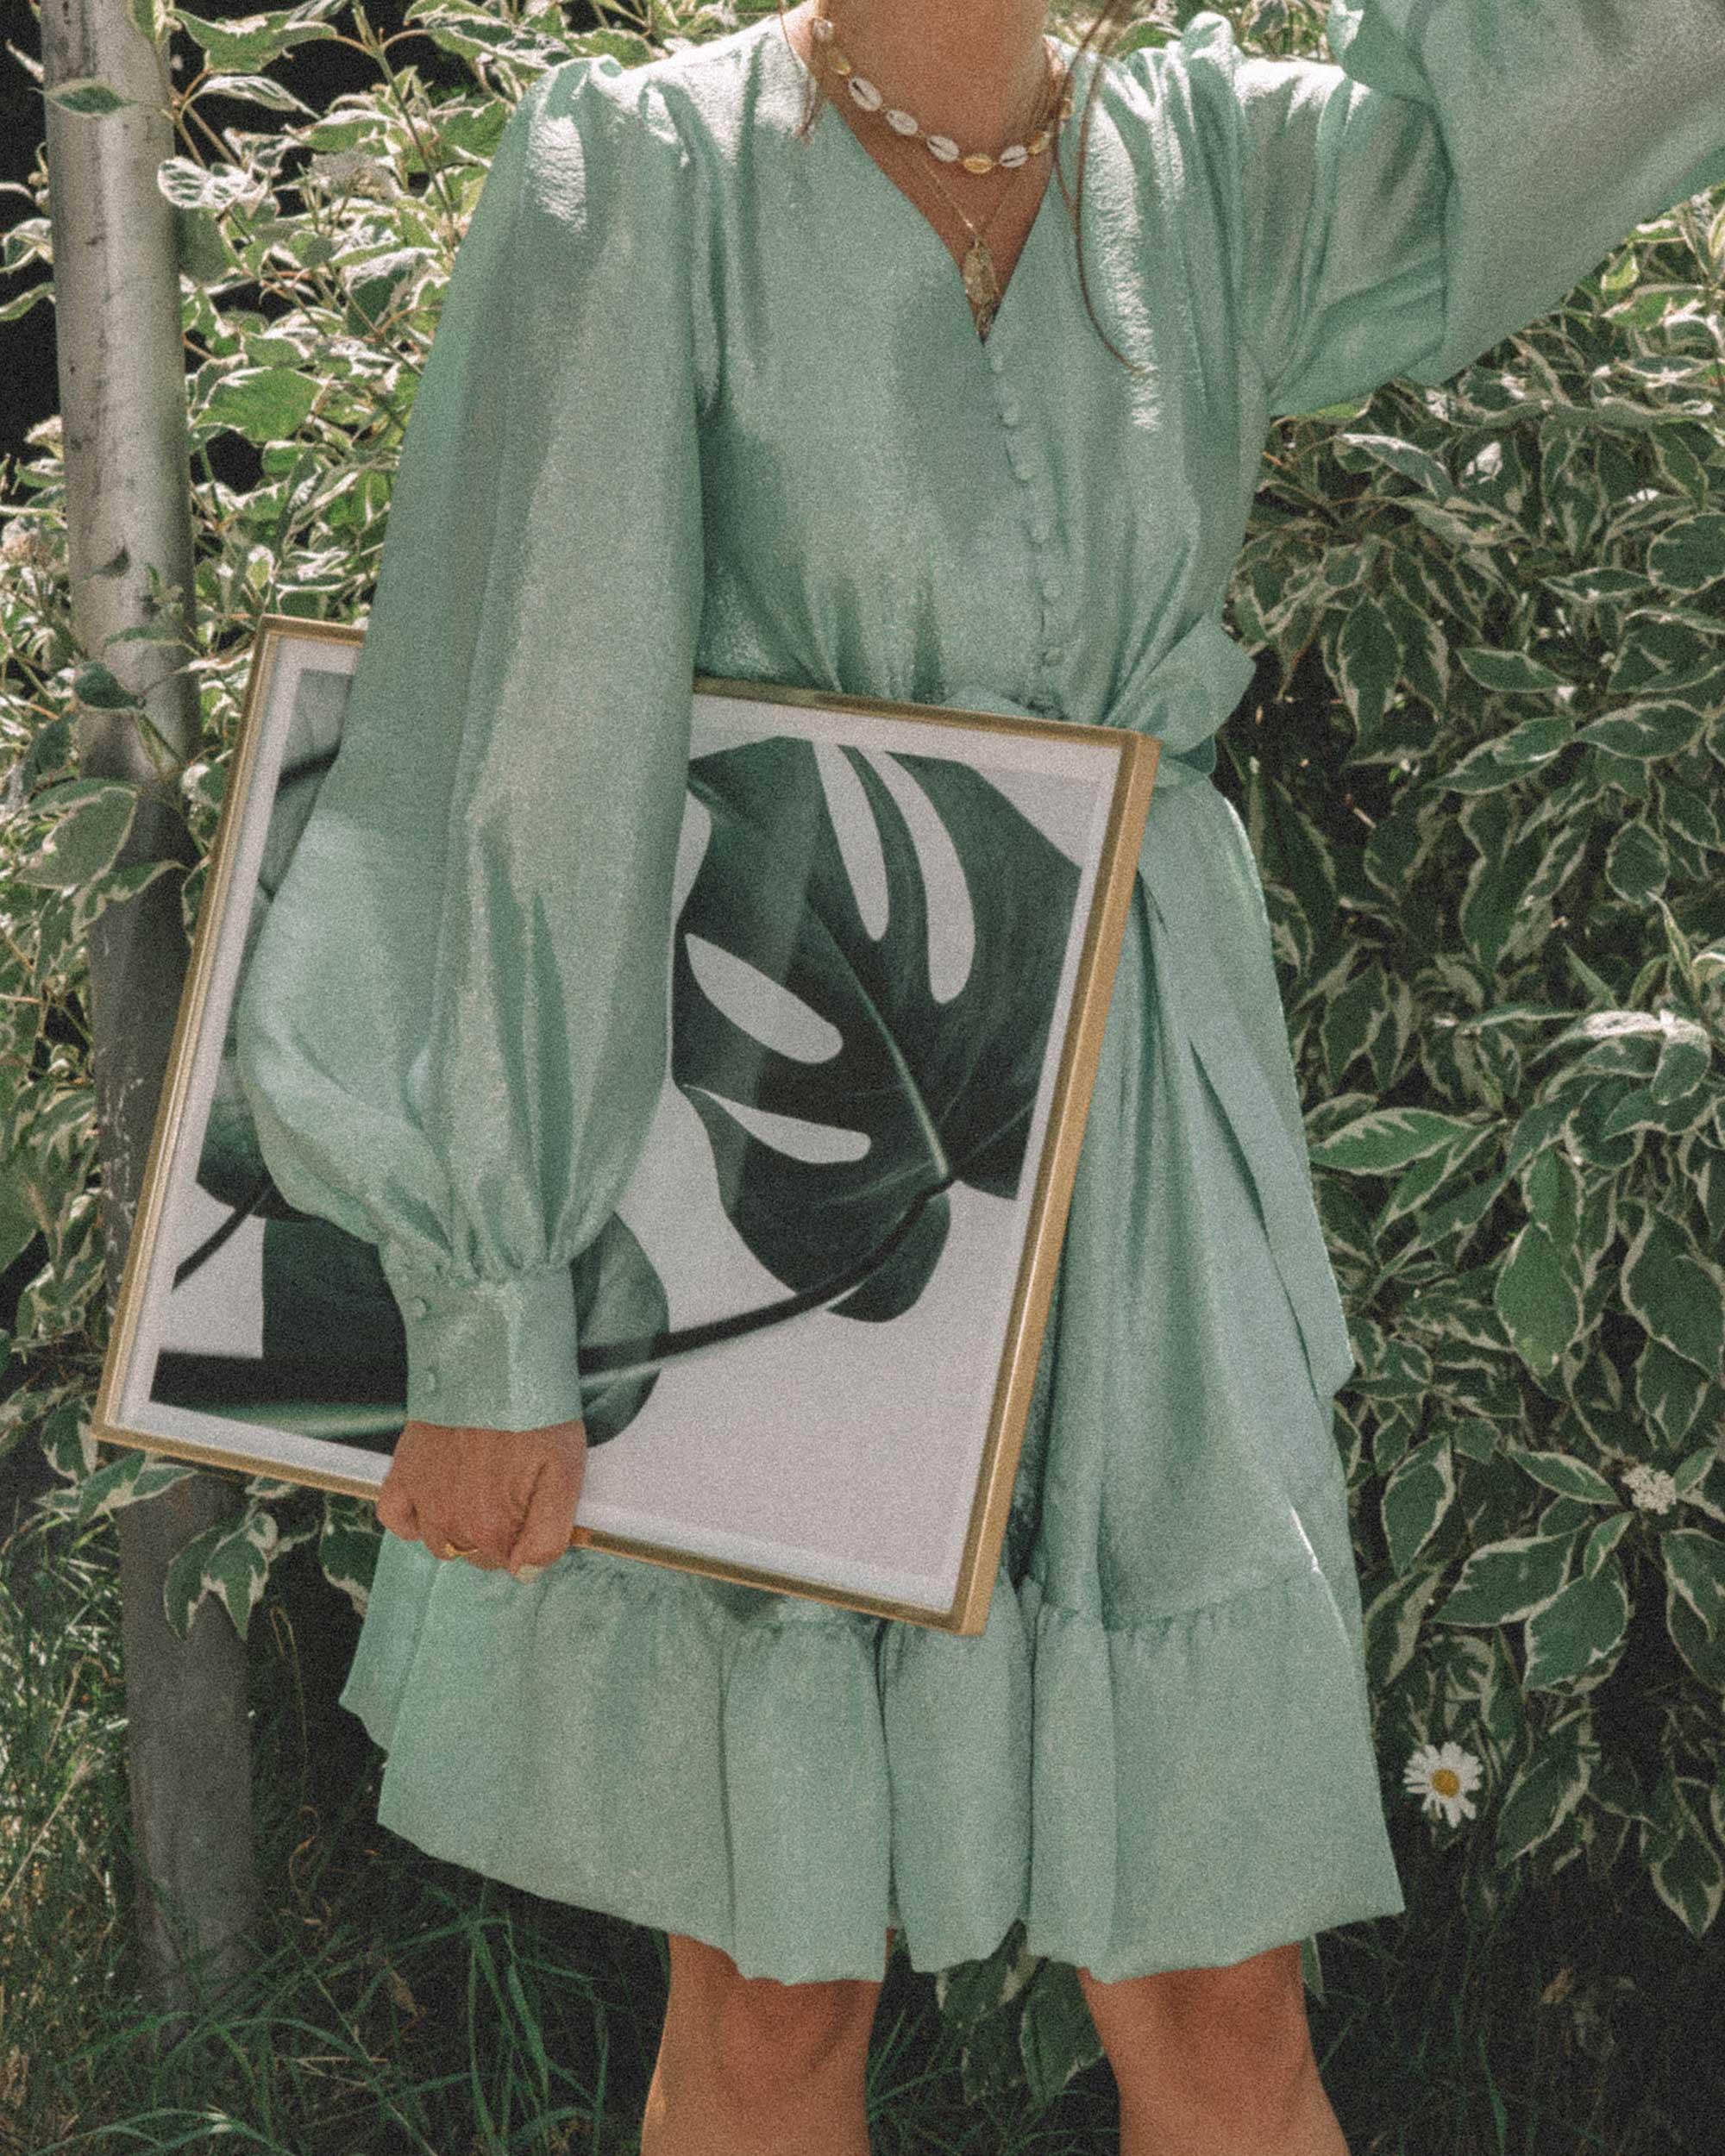 STINE GOYA Farrow Crepe Blouson Sleeve Dress in jade green satin crepe - 9.jpg